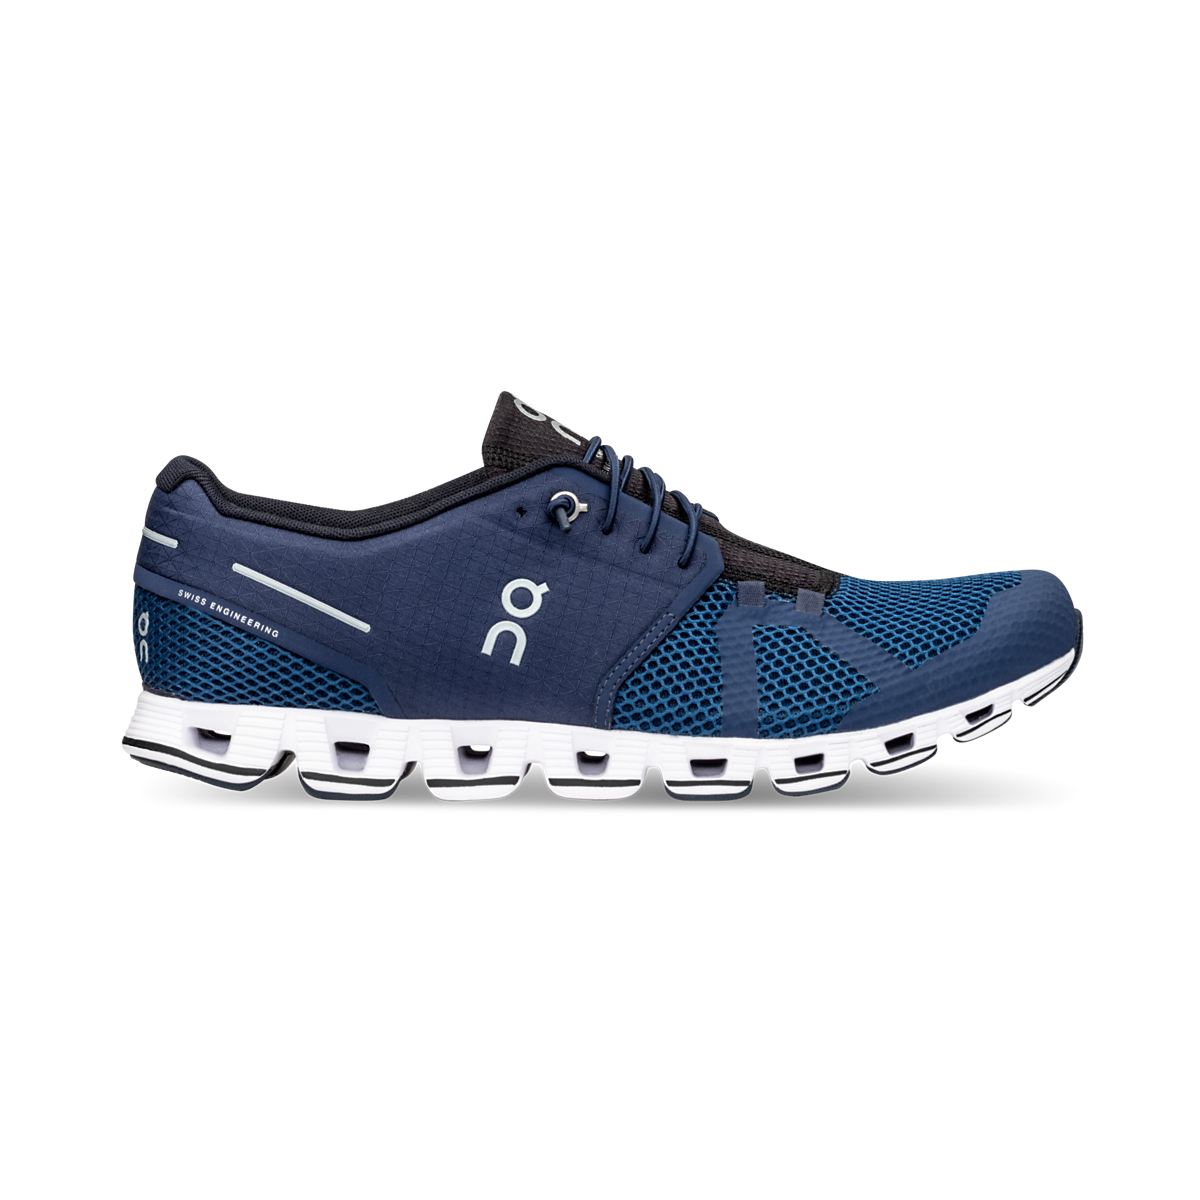 Men's On Cloud Running Shoe - Color: Midnight/Ocean - Size: 10 - Width: Regular, Midnight/Ocean, large, image 1